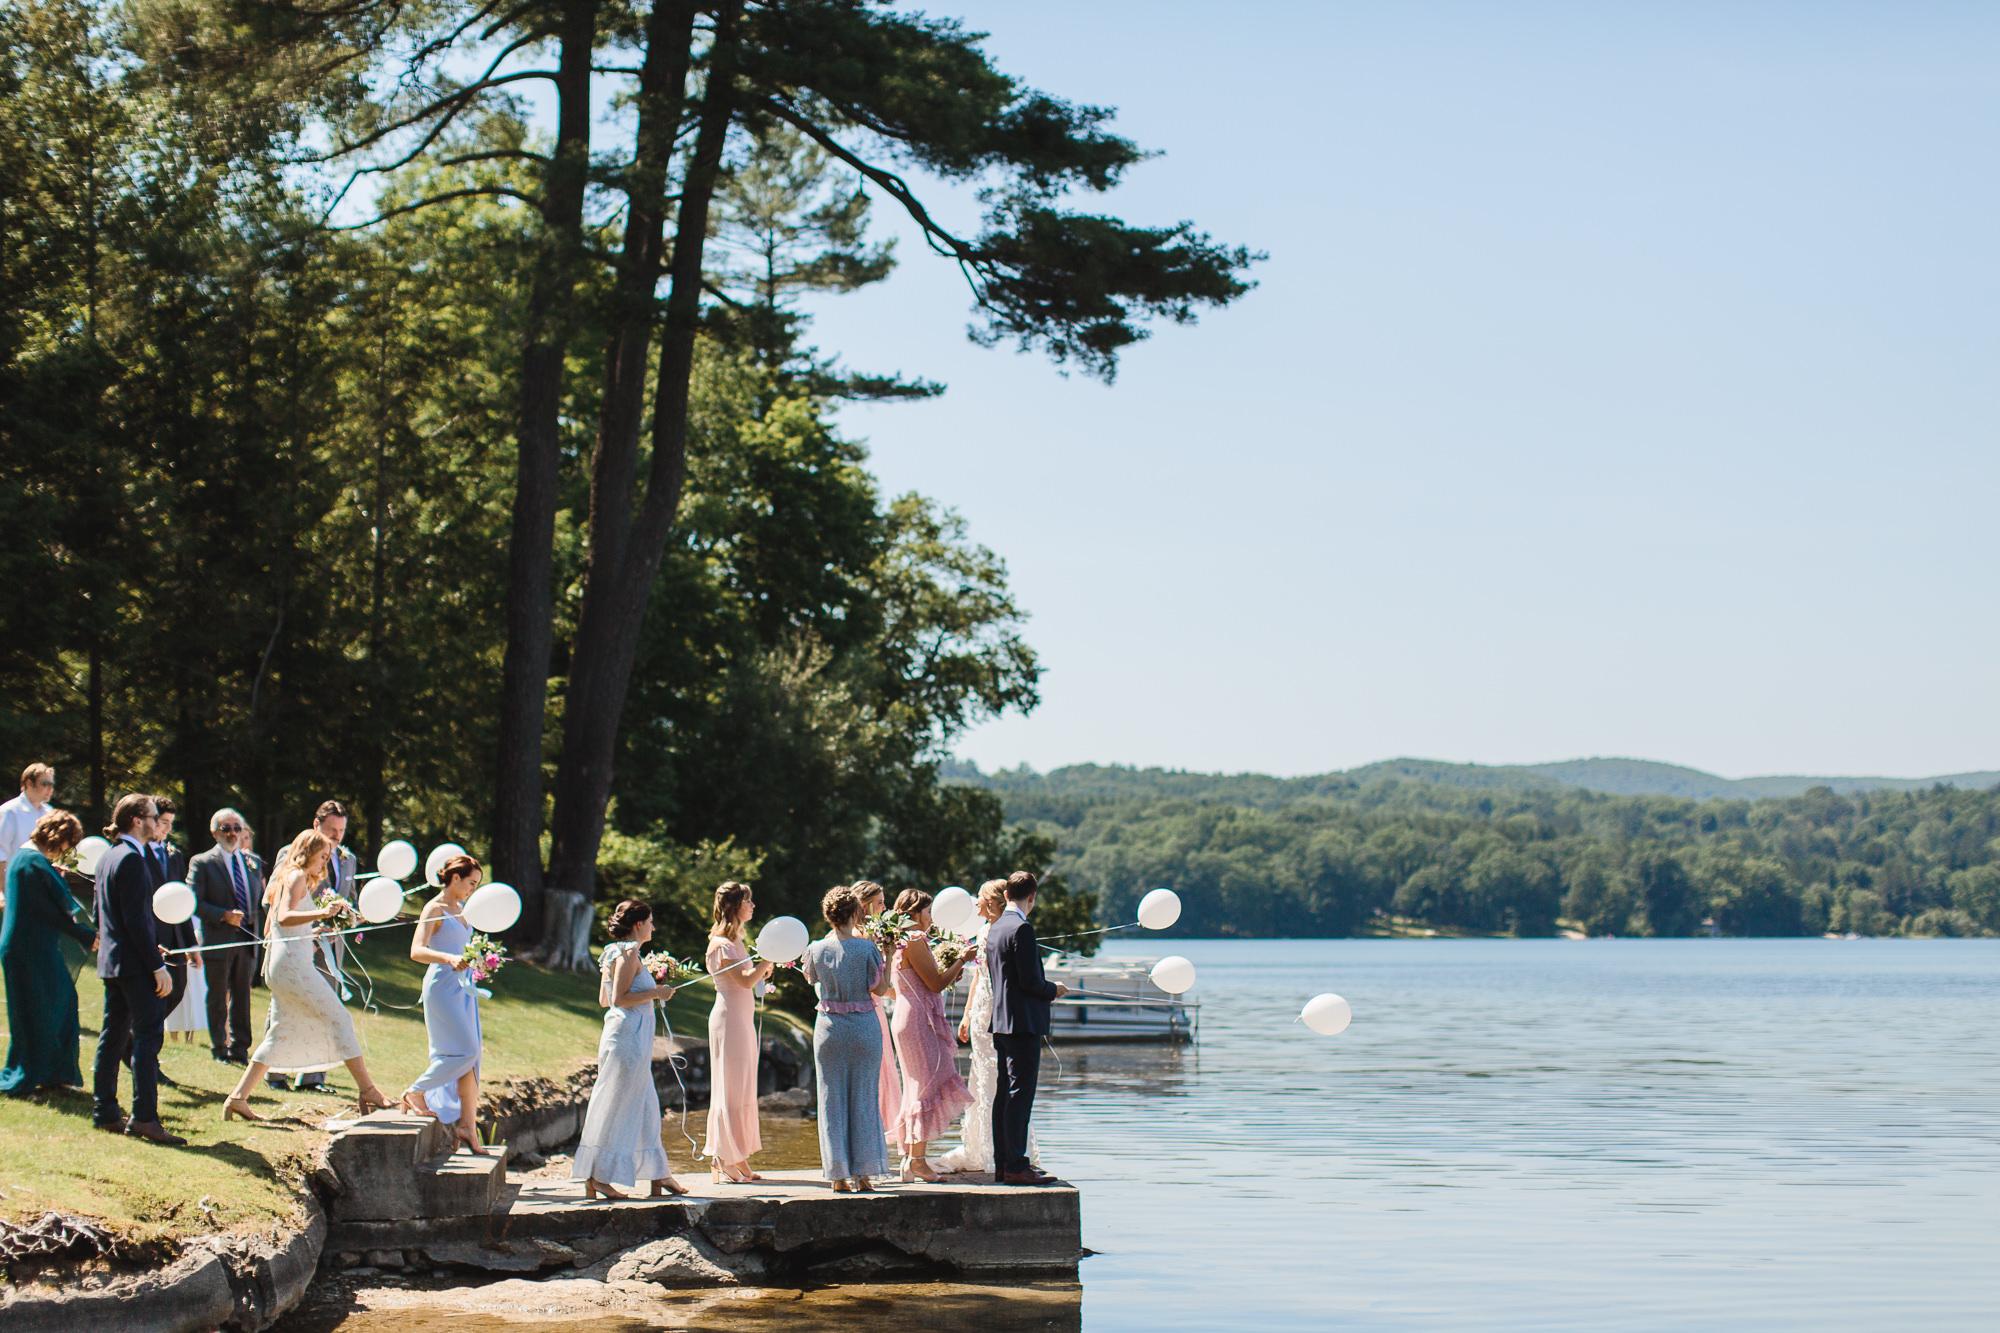 connecticut-summer-lake-wedding-emily-kirke-photography-upstyle (65 of 181).jpg